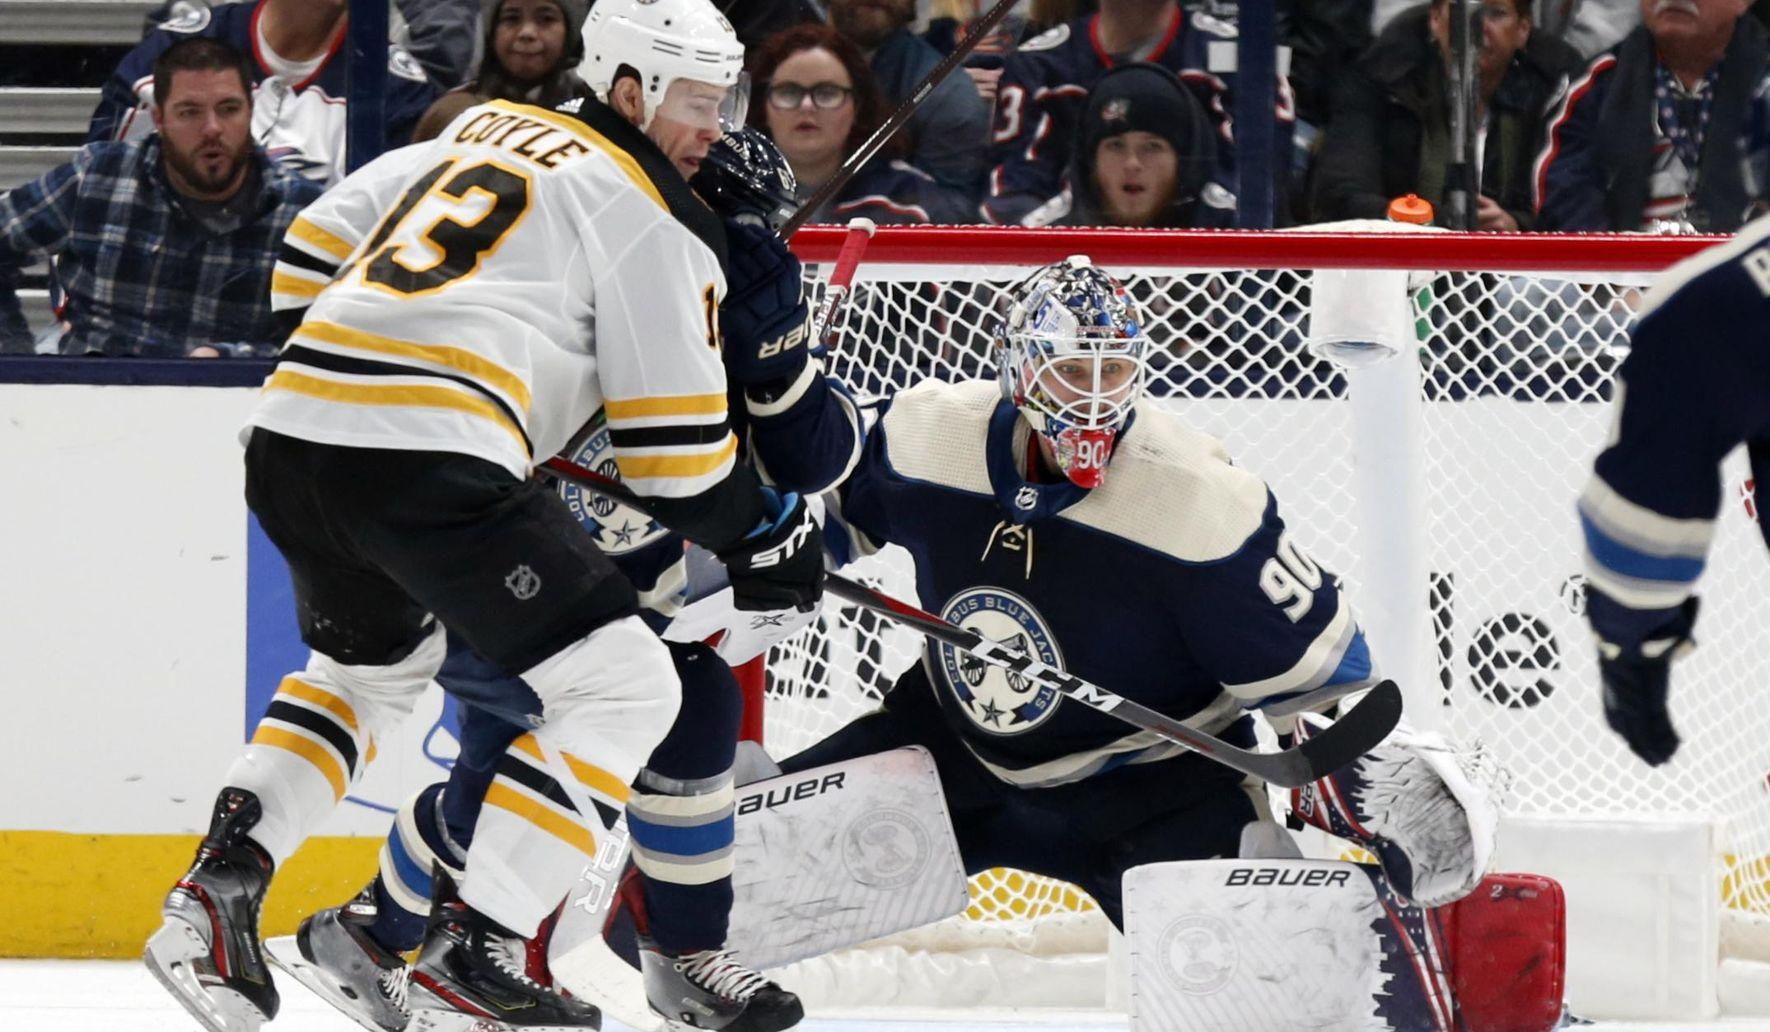 Bruins_blue_jackets_hockey_52253_c0-149-2150-1402_s1770x1032